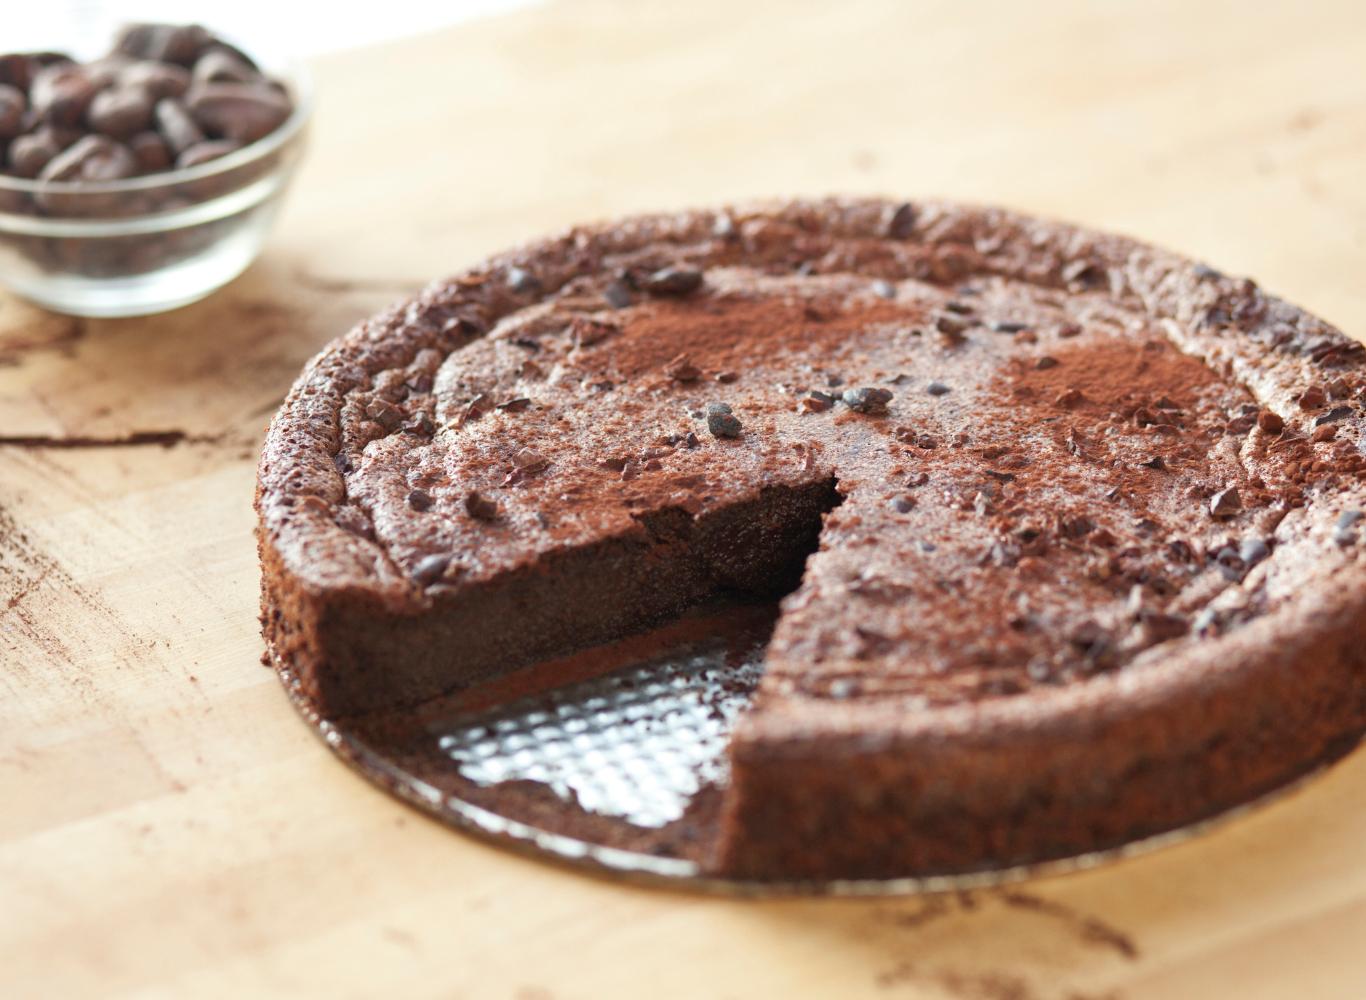 receitas de bolo de aveia a experimentar